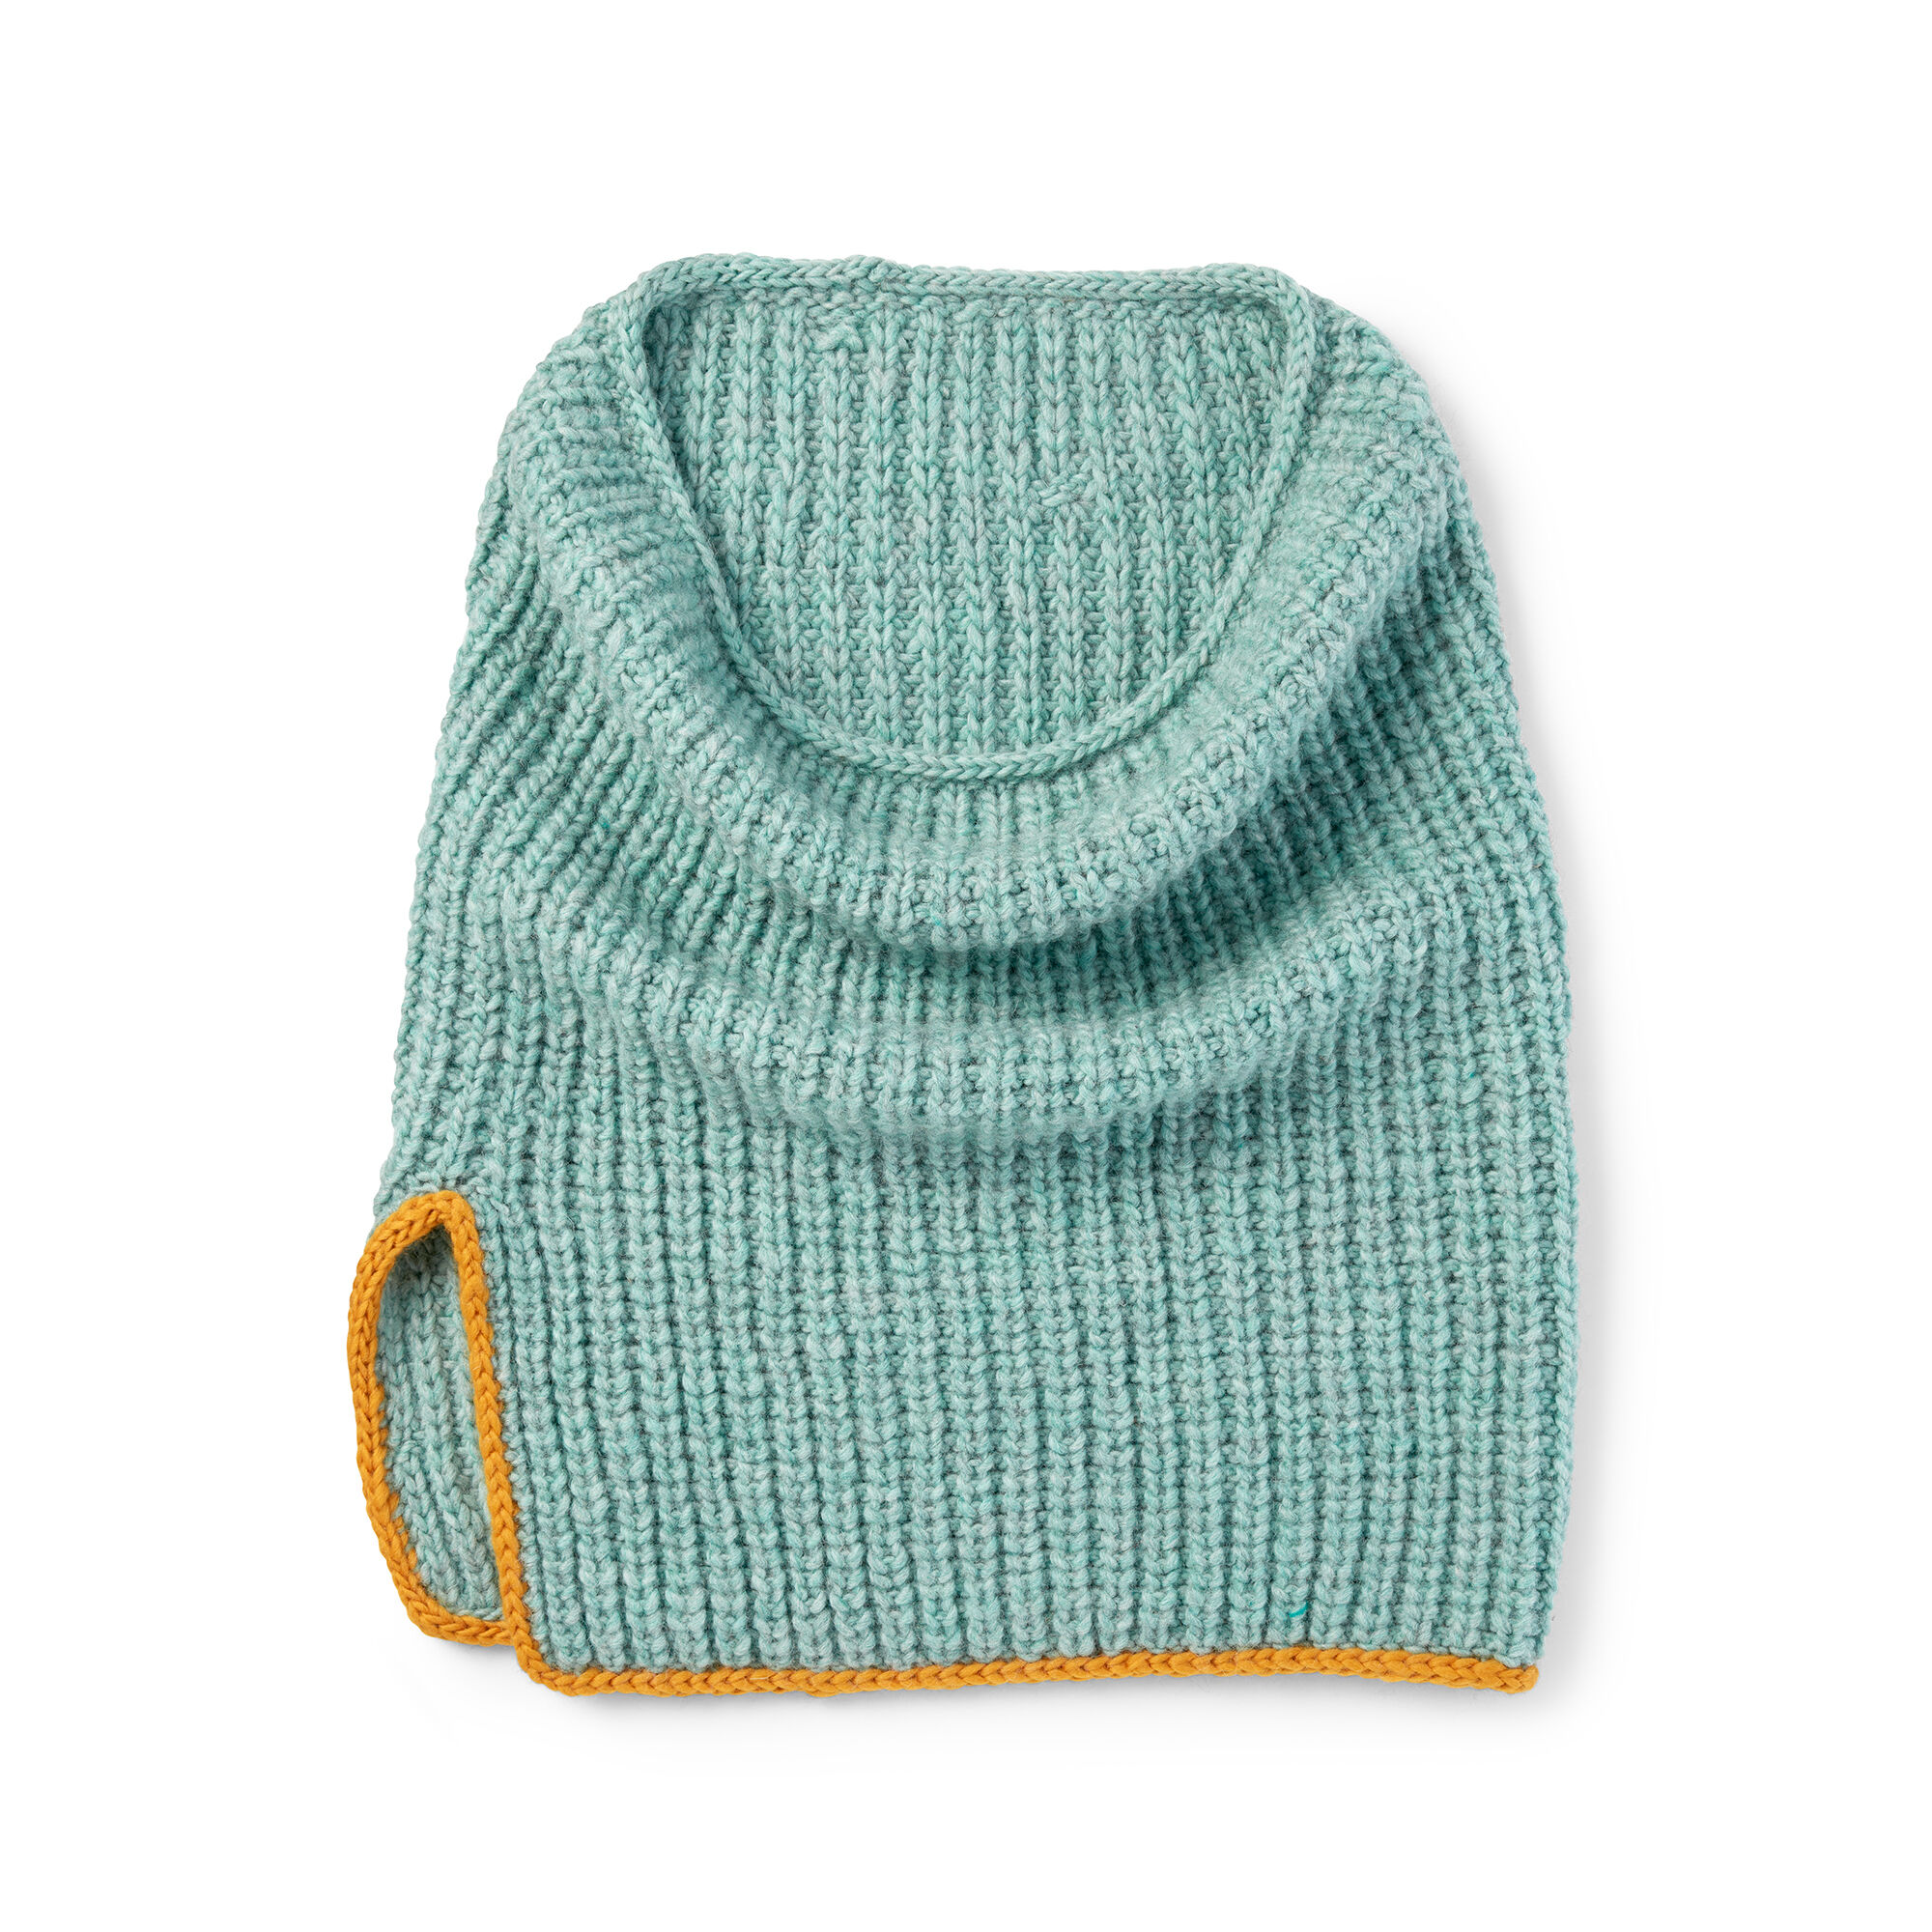 Patons Split Rib Knit Cowl Pattern | Yarnspirations